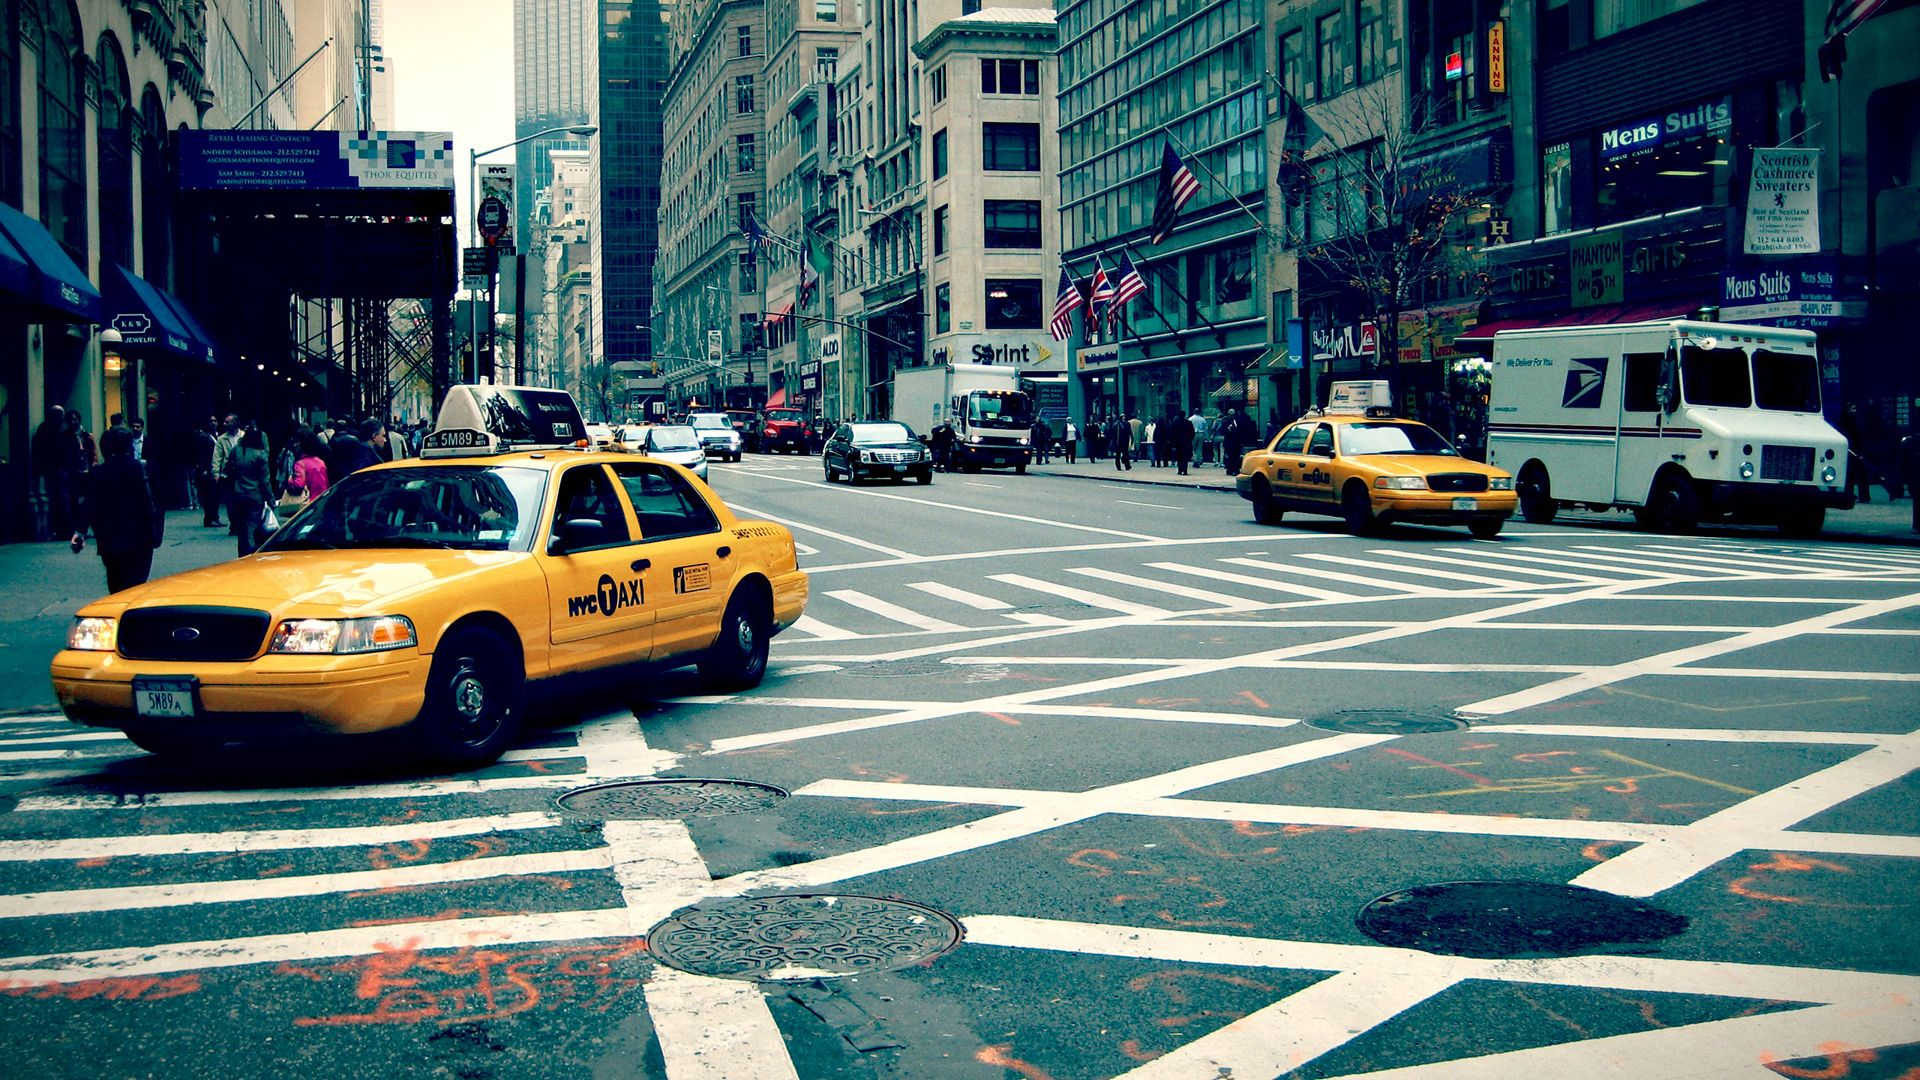 New York Street HD Wallpaper